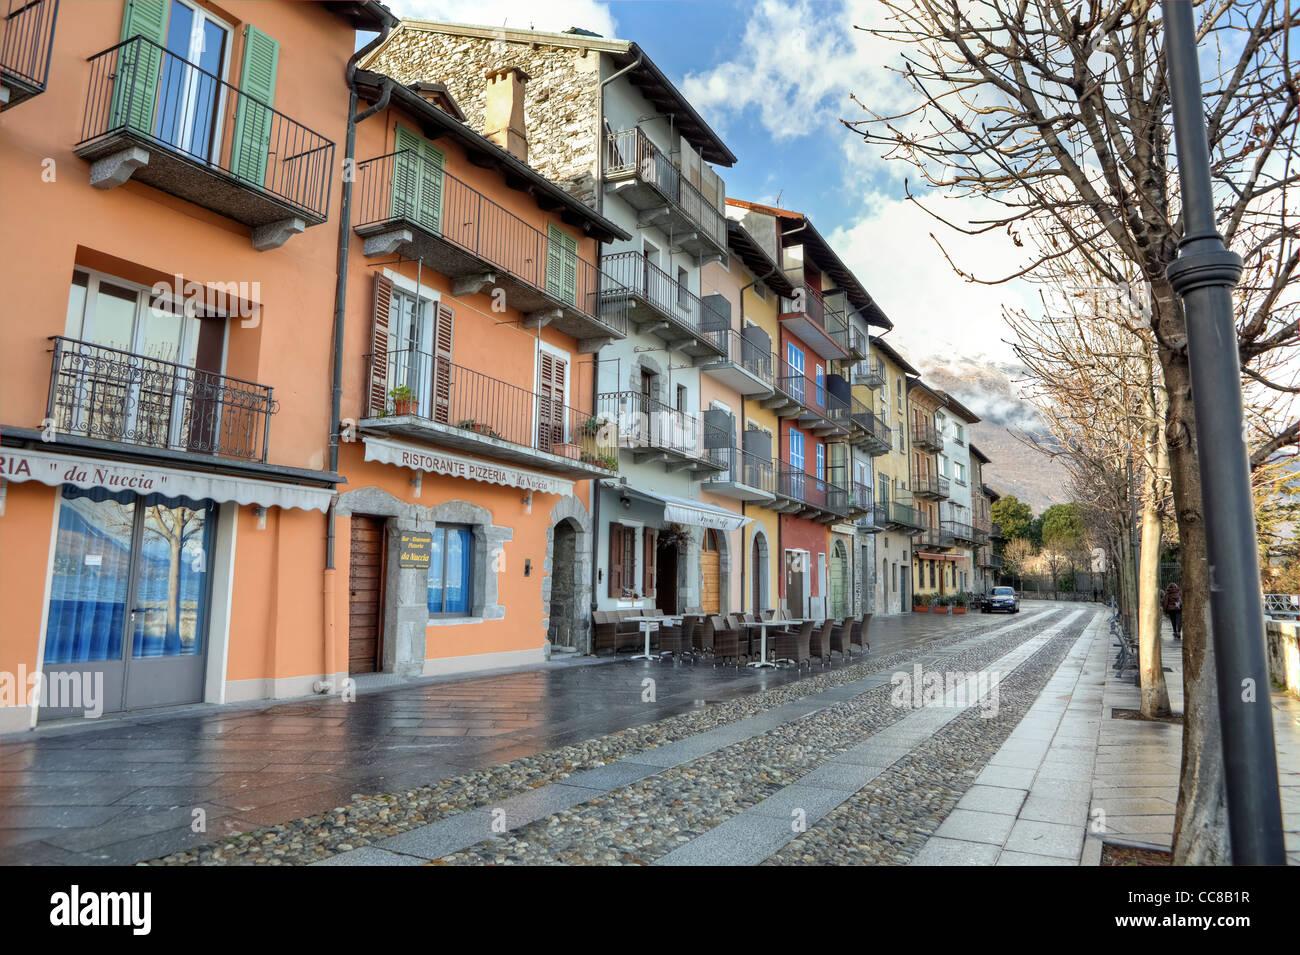 Promenade of Cannobio, Verbania, Piedmont, Italy in winter - Stock Image